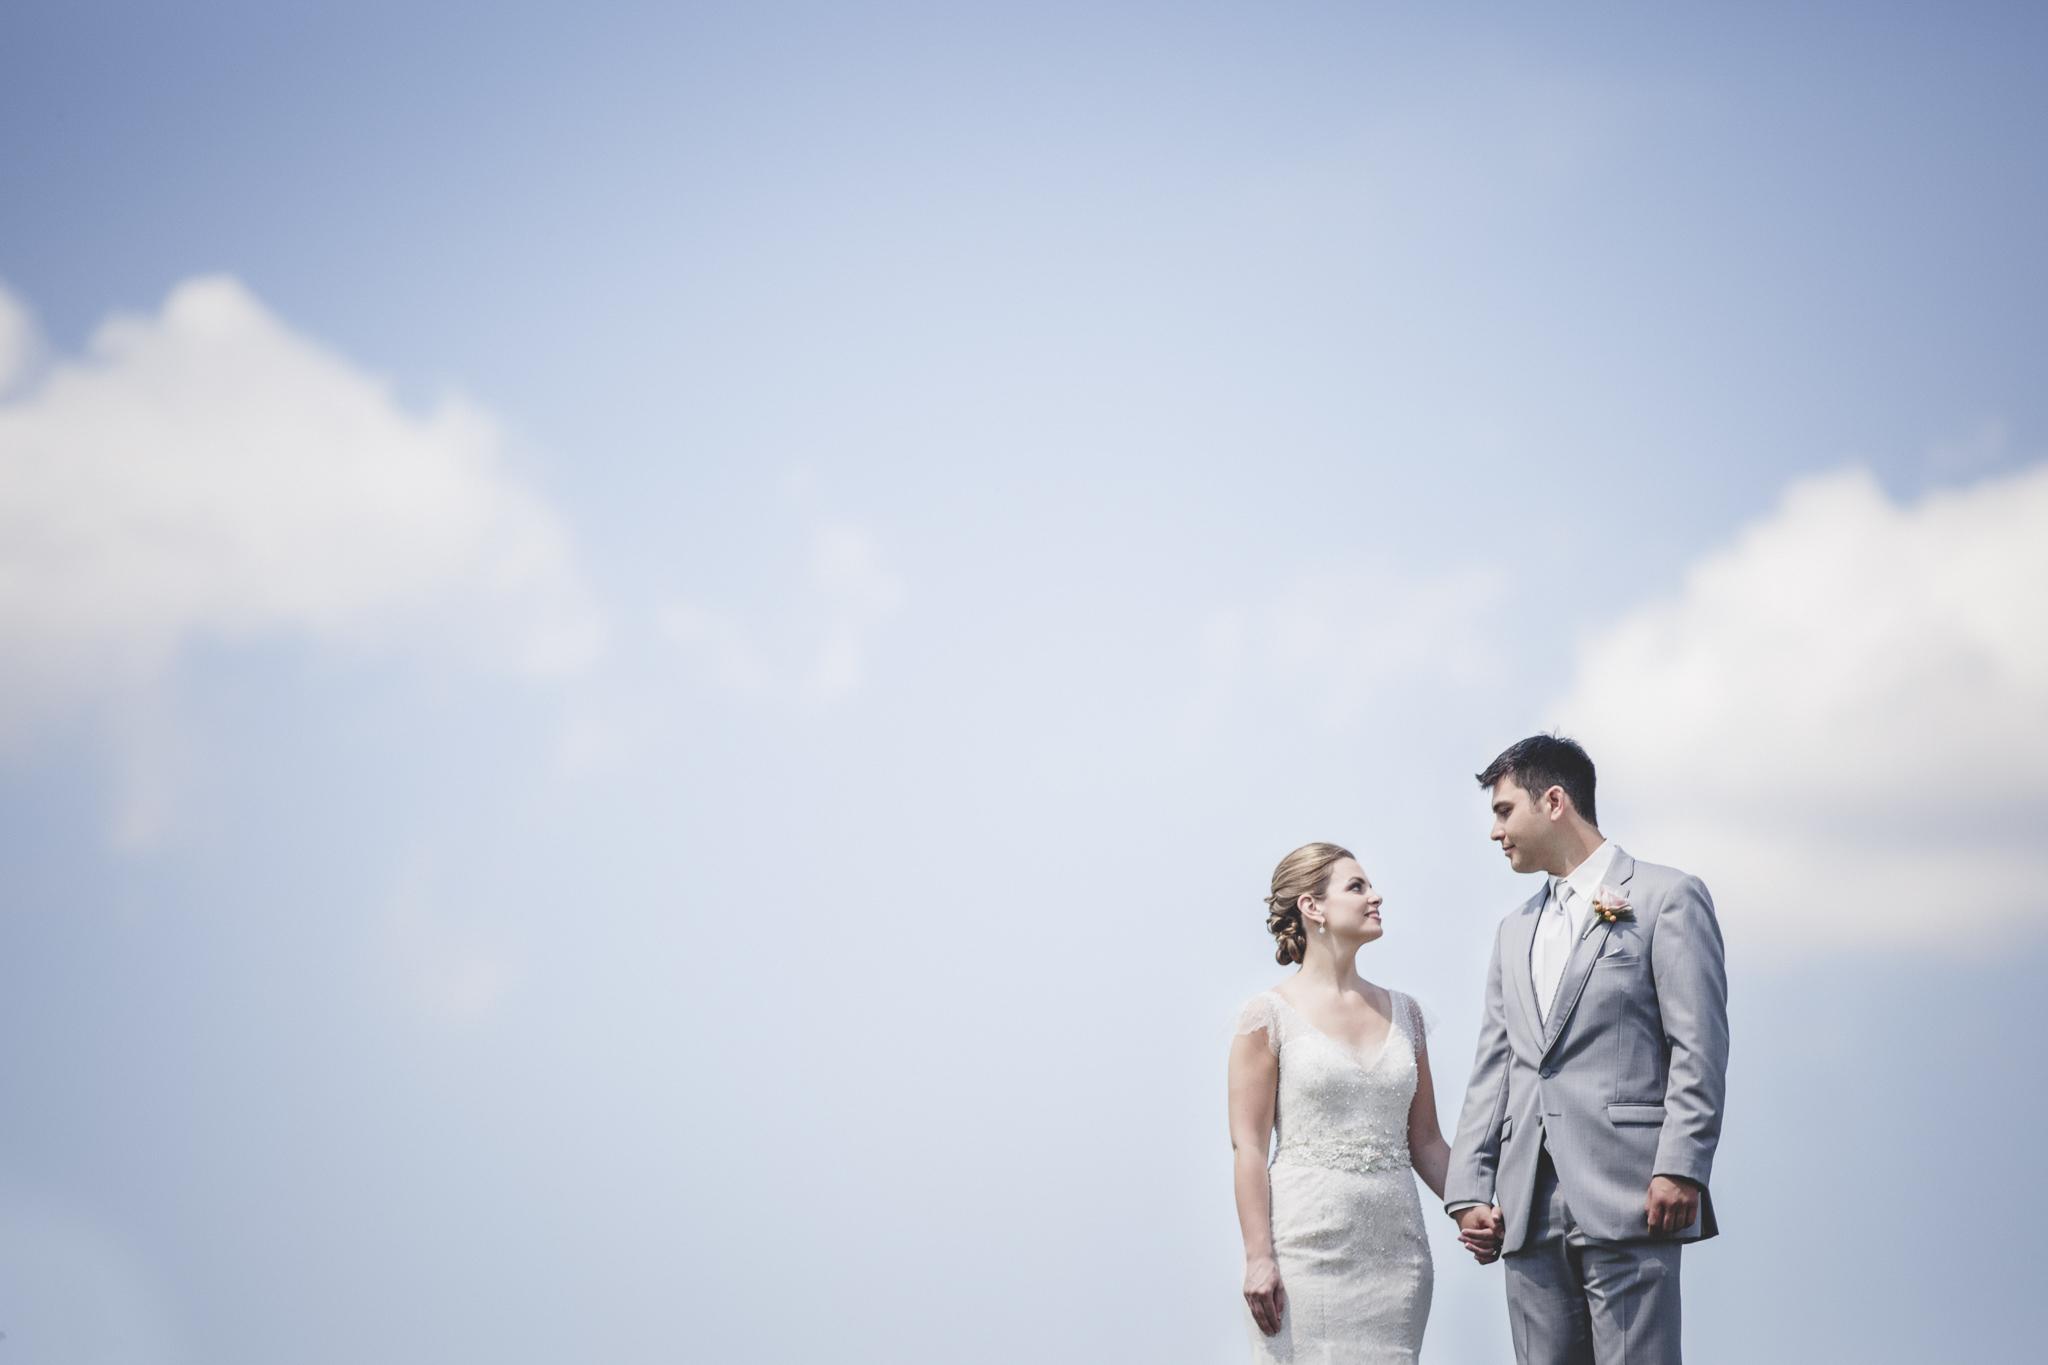 minneapolis event center wedding photographer-13.jpg